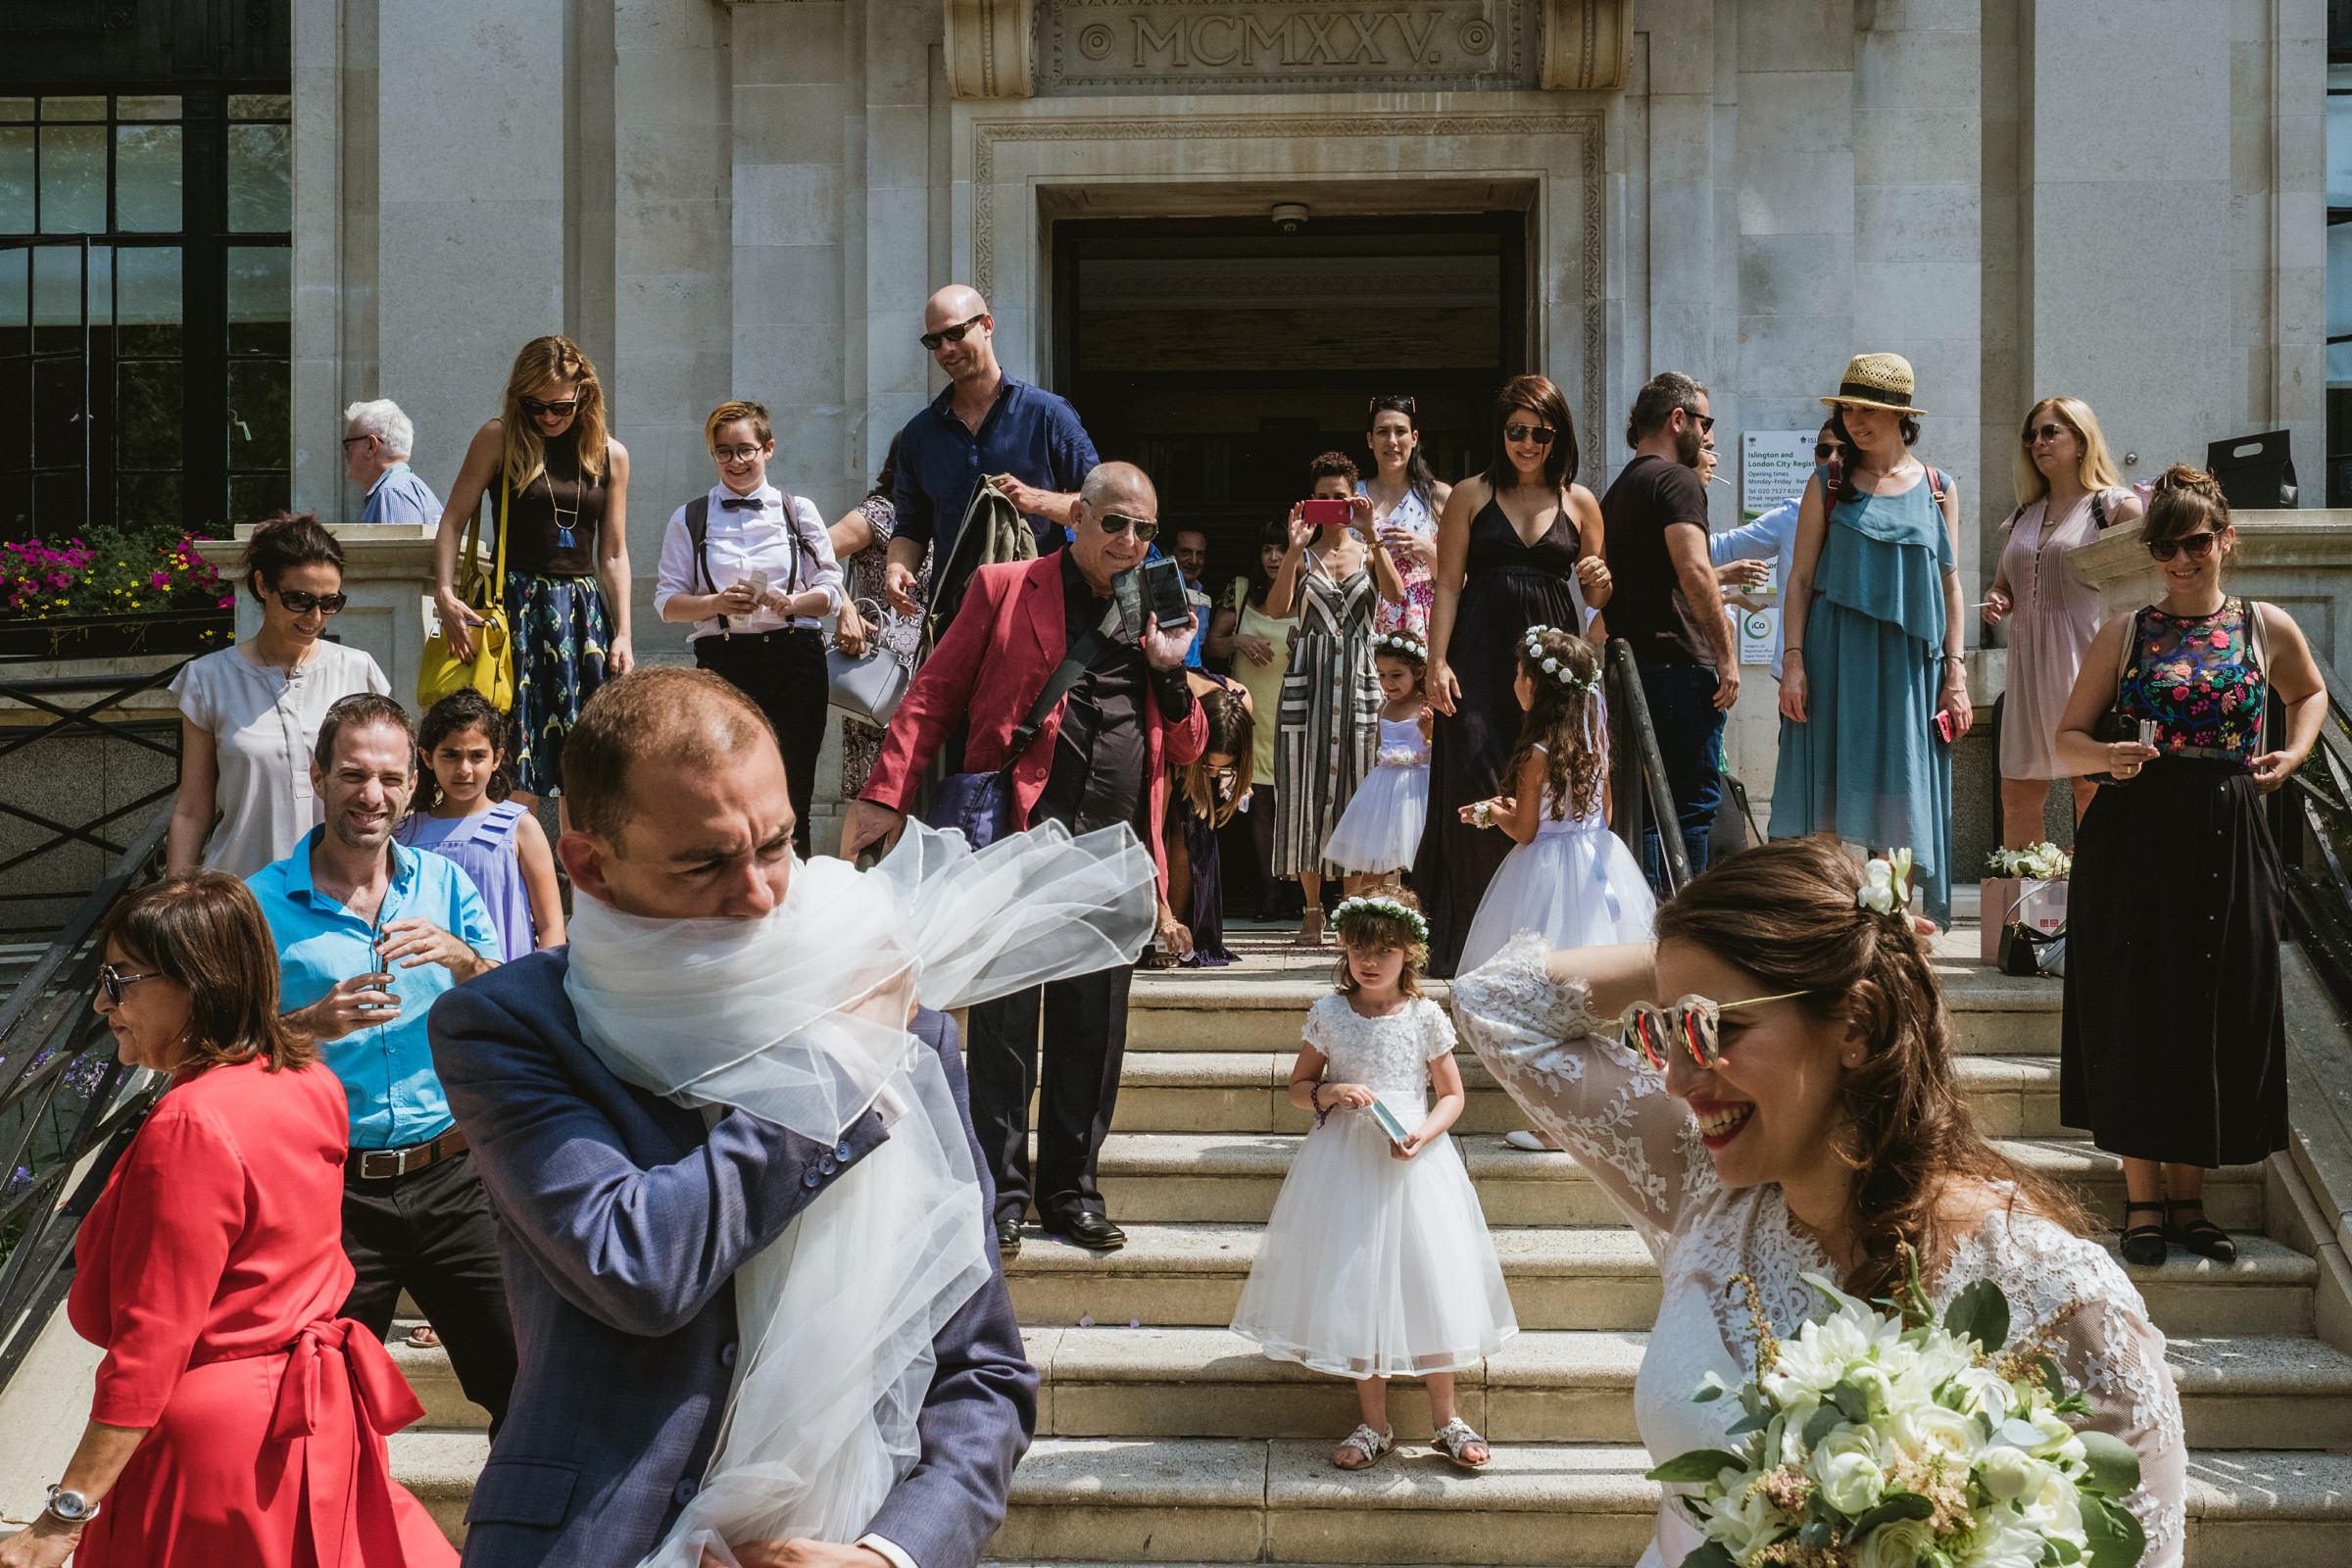 Groom wraps himself in veil amidst onlookers - photo by York Place Studios